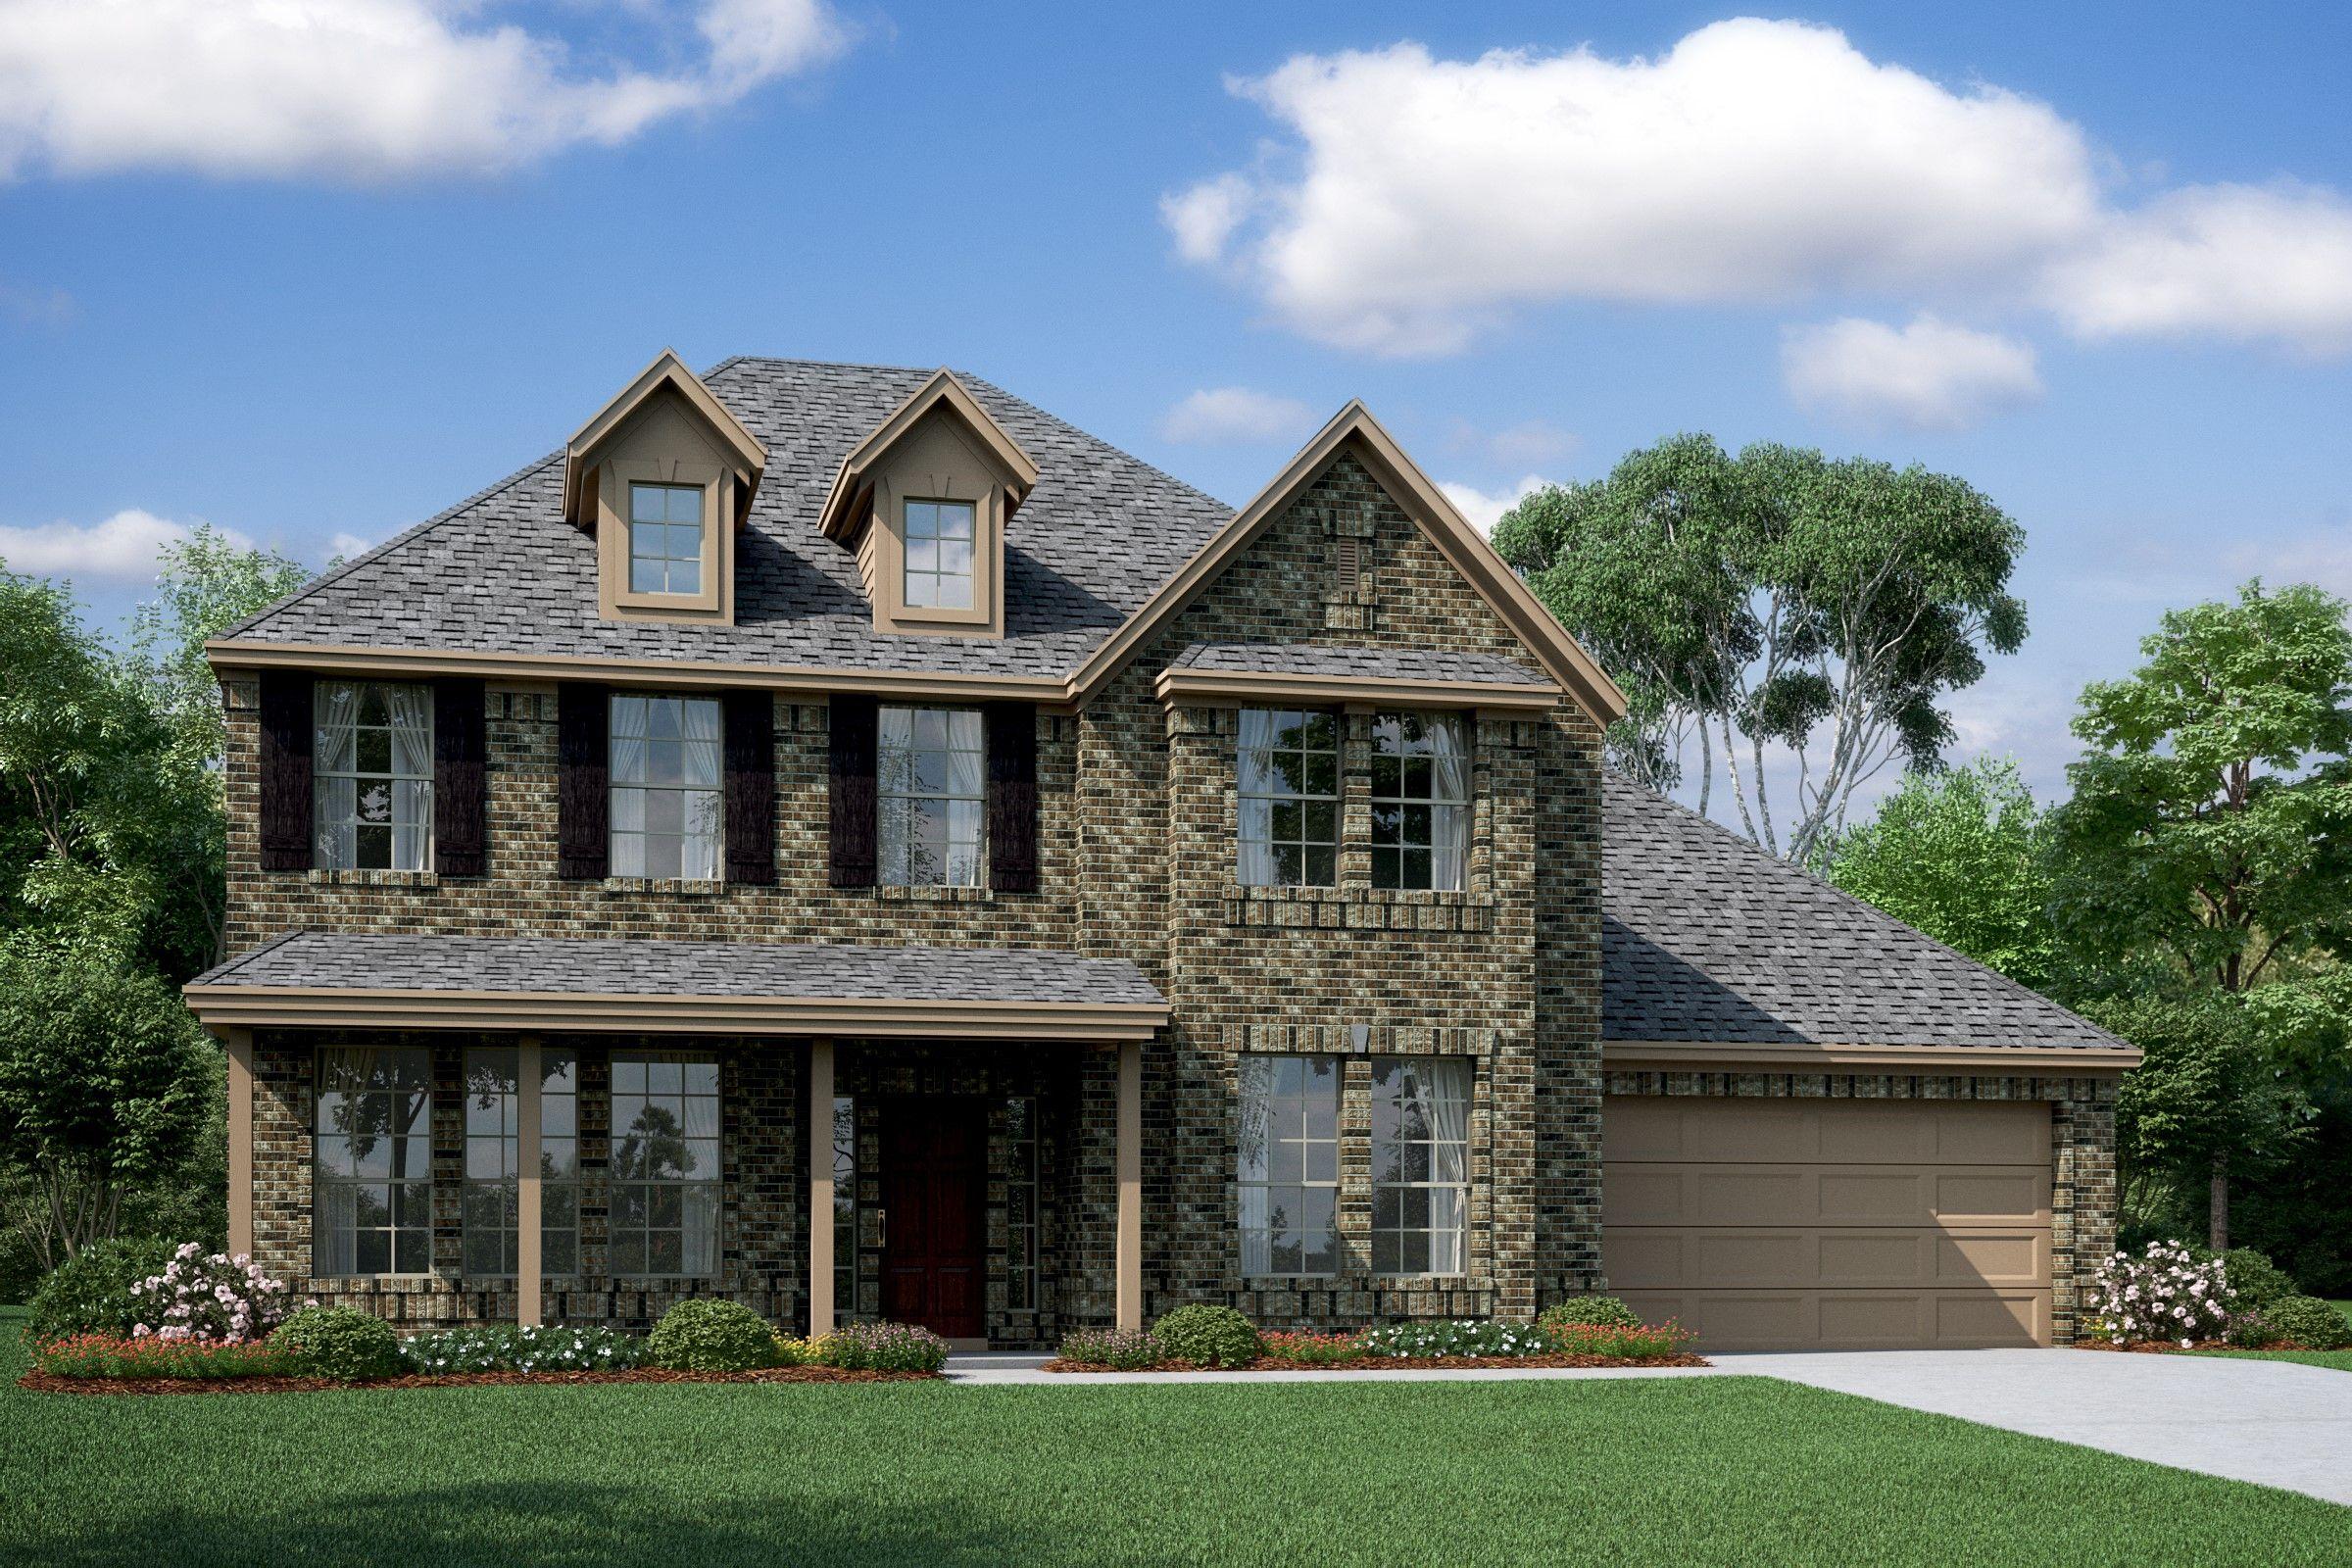 Single Family for Sale at Thunder Bay - Millie Mccollum Park Rd & Thunder Bay Beach City, Texas 77523 United States